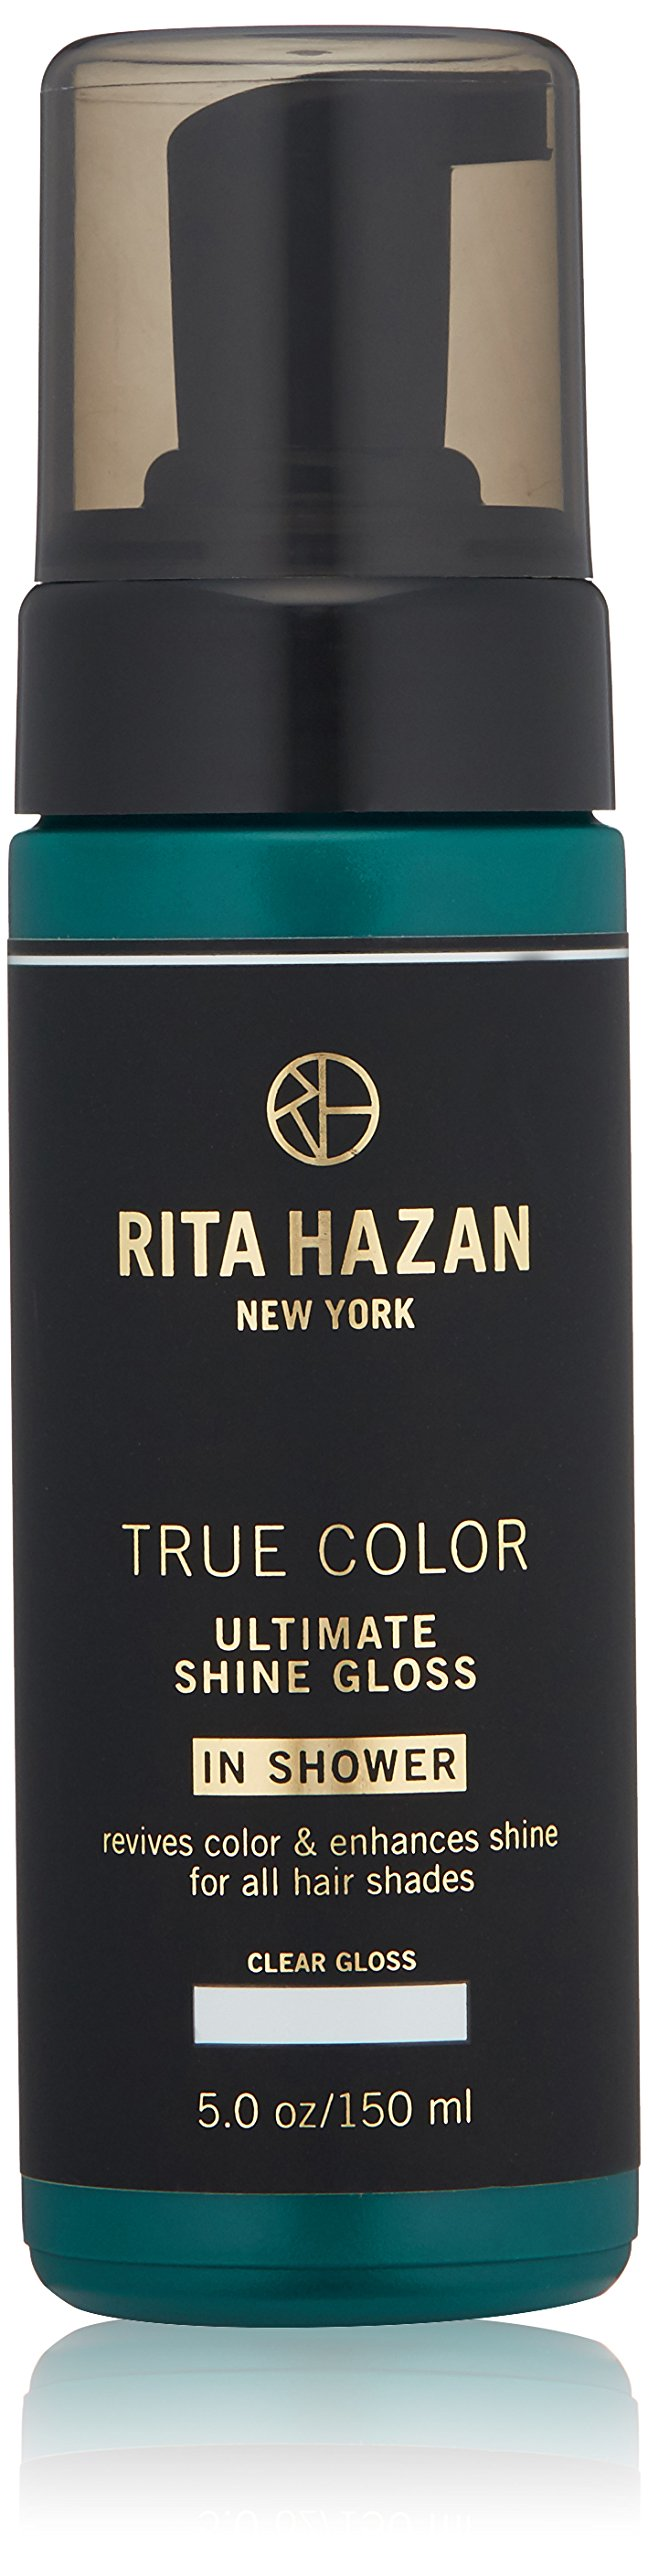 Rita Hazan- Ultimate True Color Shine Gloss- Revives Color and Enhances Shine(In Shower)